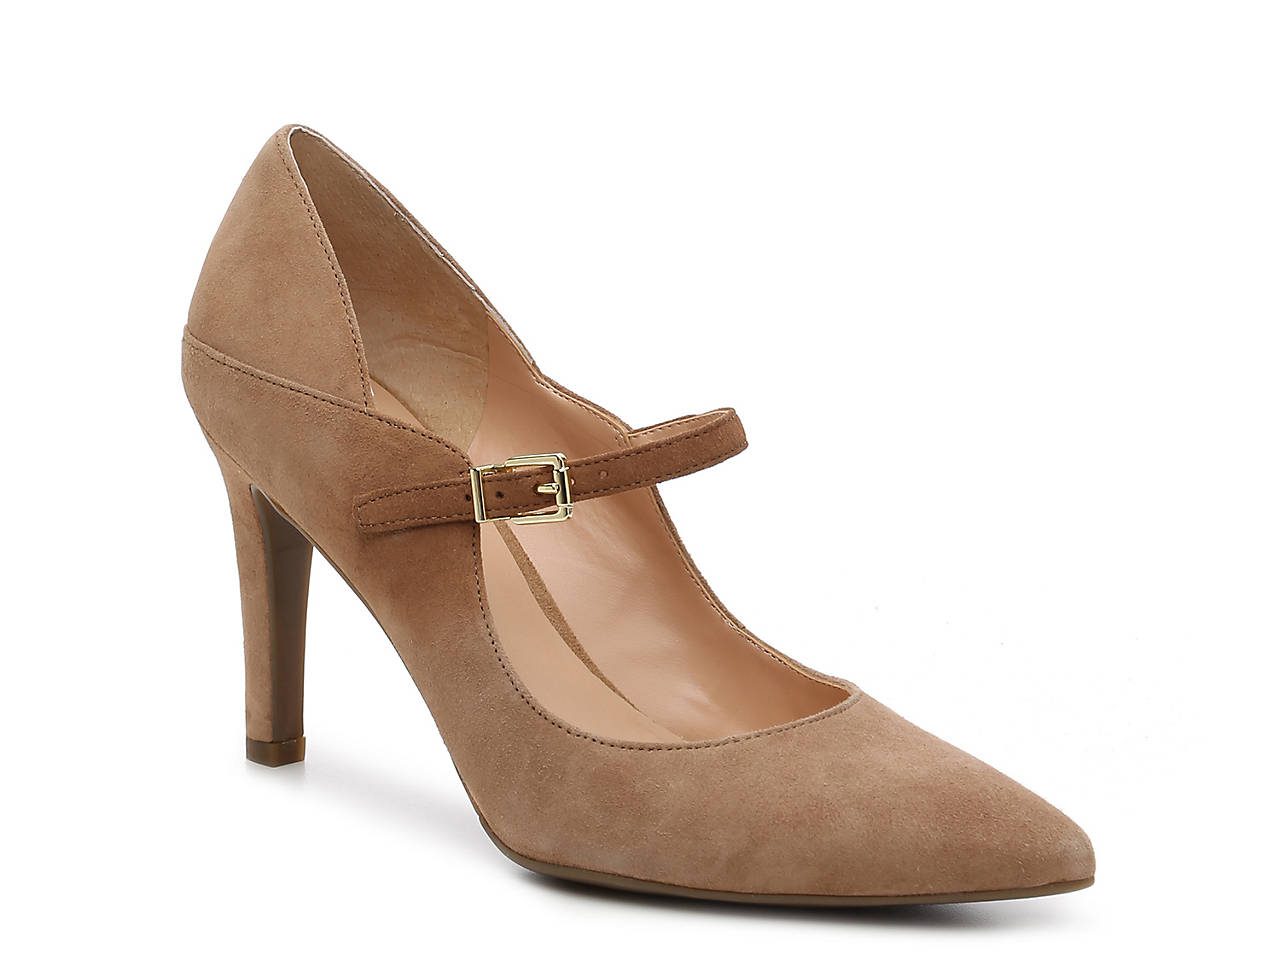 57b1a974731 Franco Sarto Anthem Pump Women s Shoes